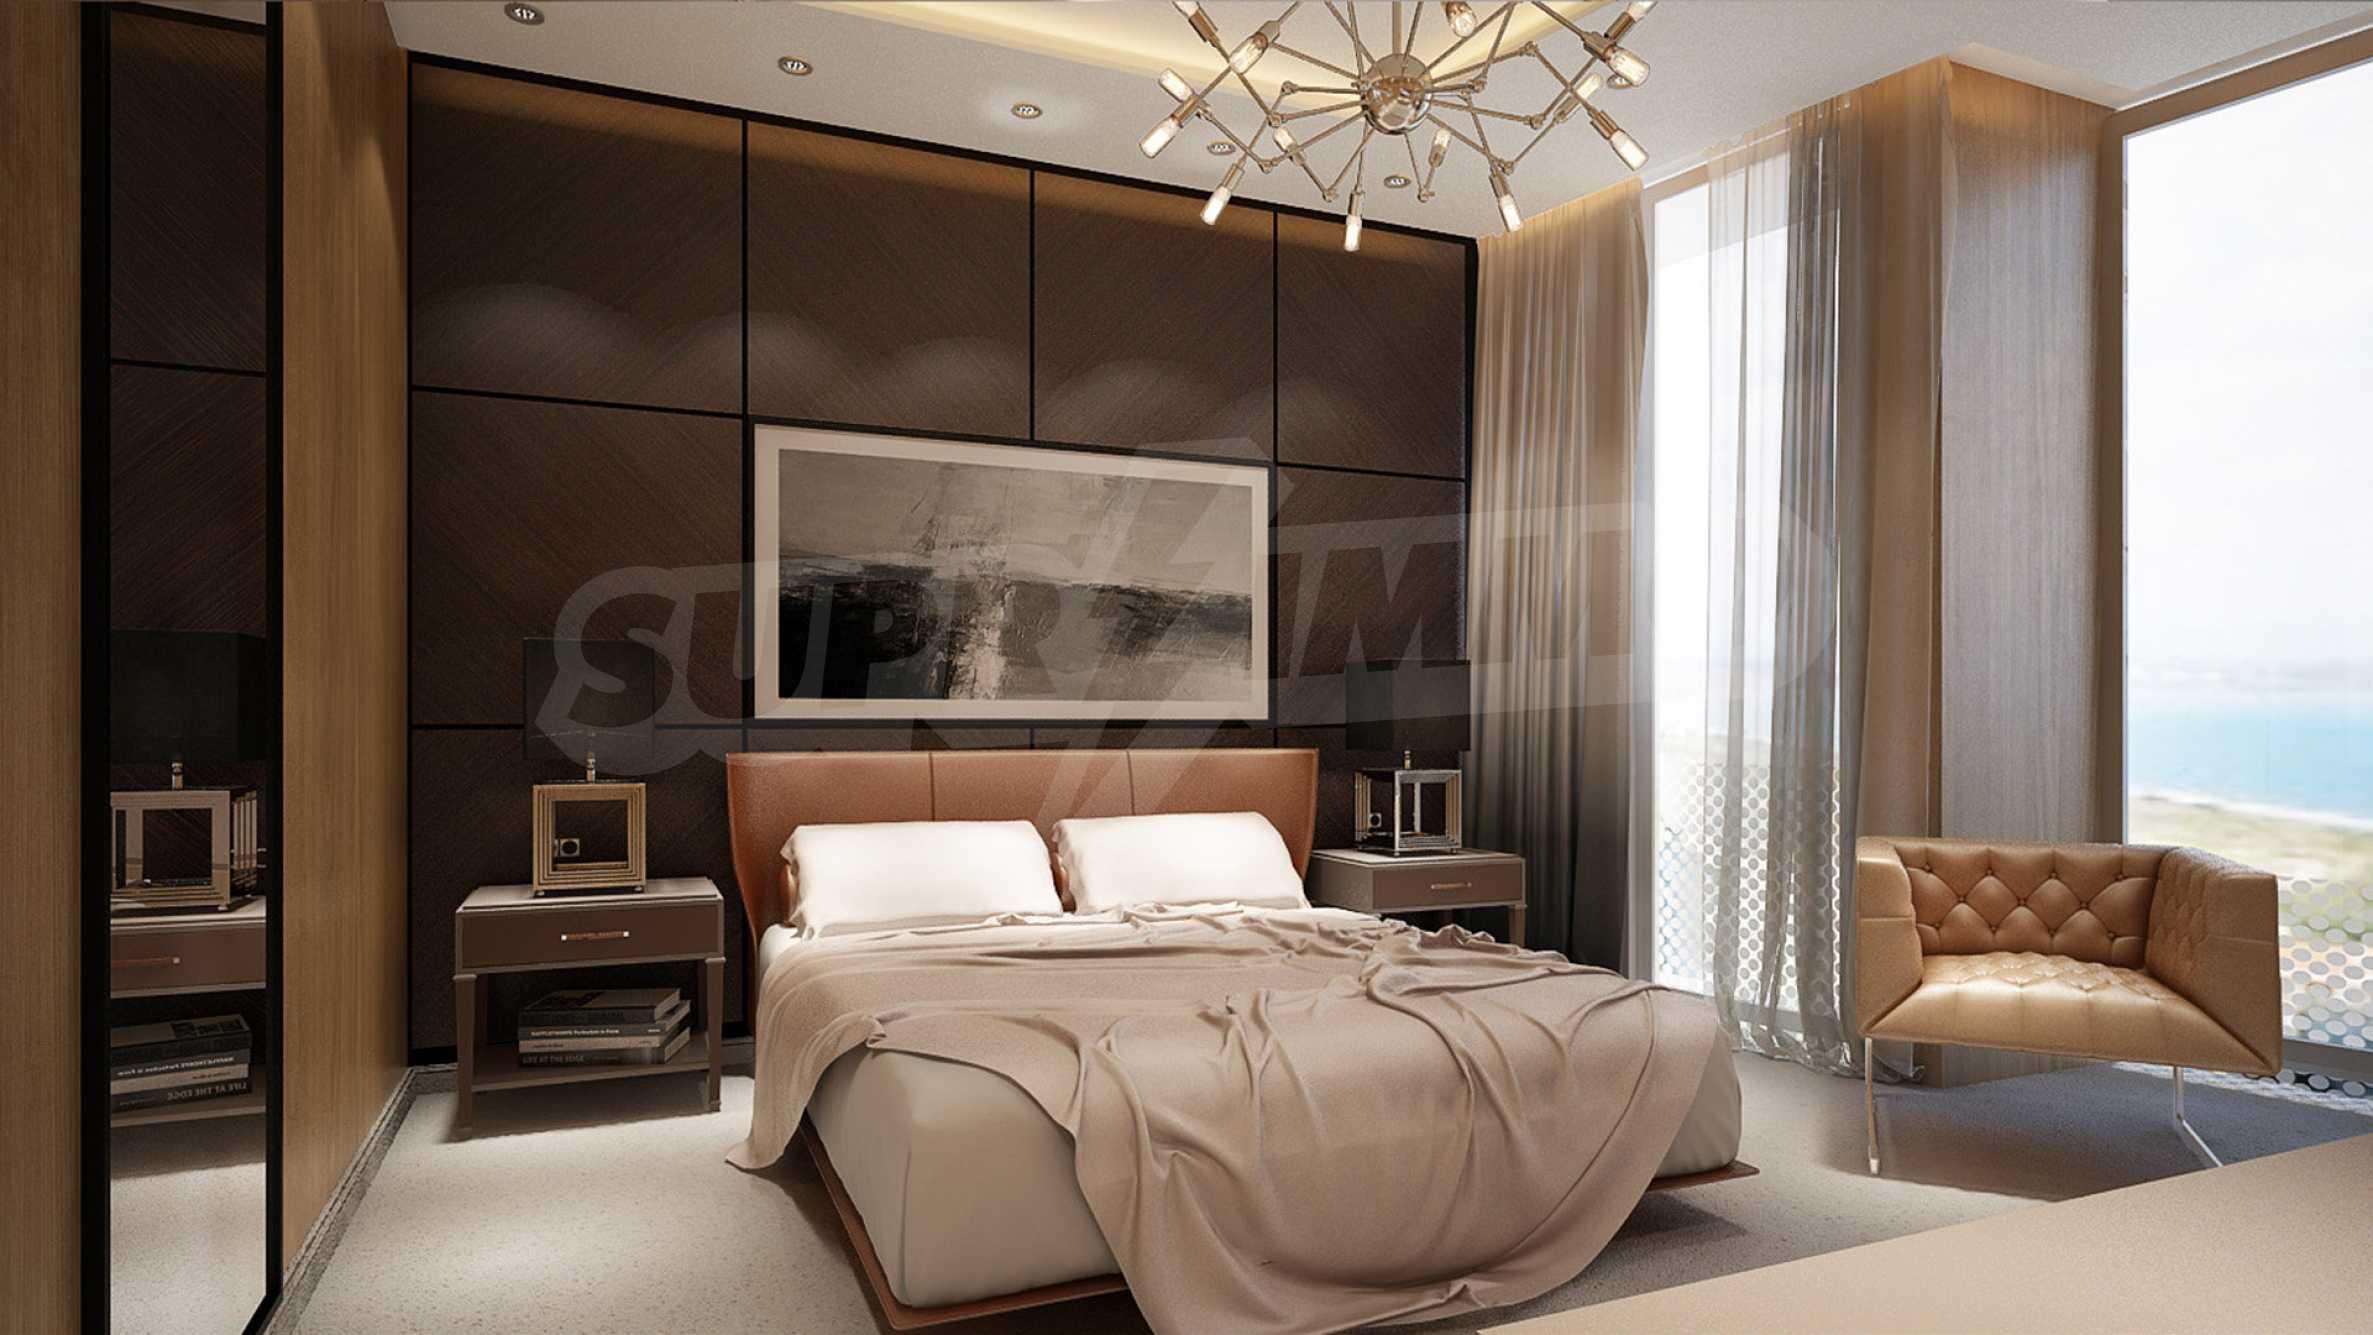 Нова сграда с луксозни апартаменти в гр. Бургас 57